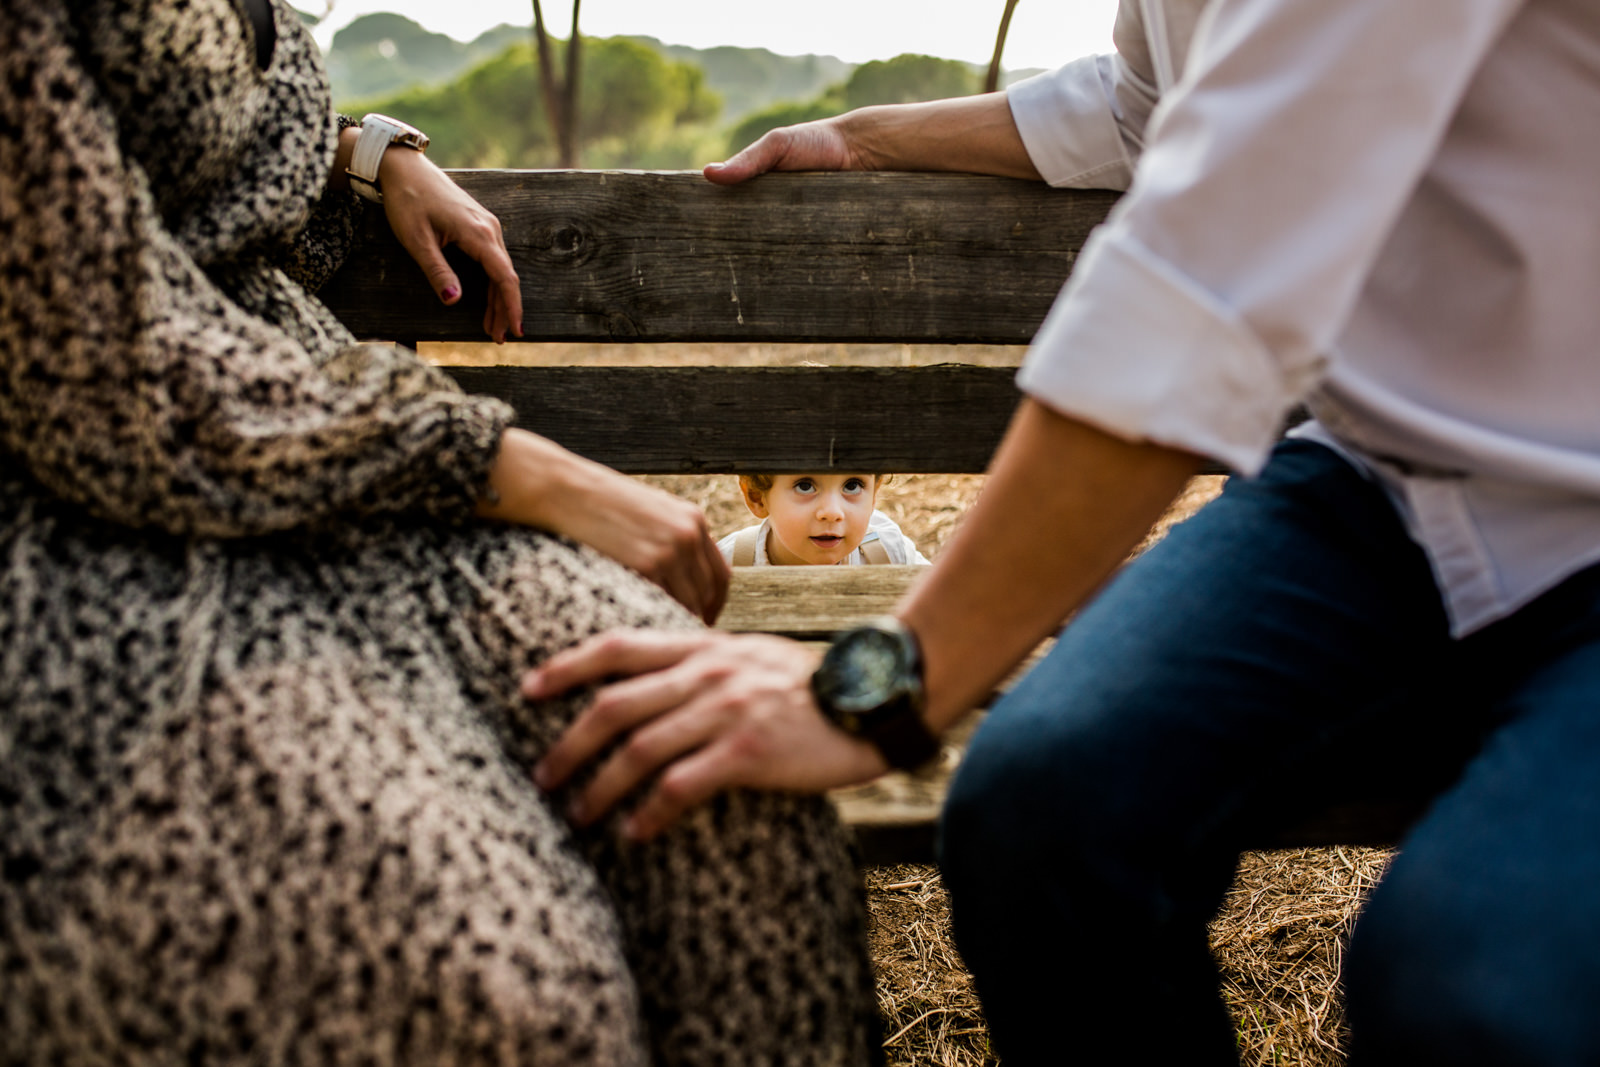 Boda-Sevilla-Parador-Carmona-bridal-engagement-Rafael-Torres-fotografo-bodas-sevilla-madrid-barcelona-wedding-photographer--1.jpg